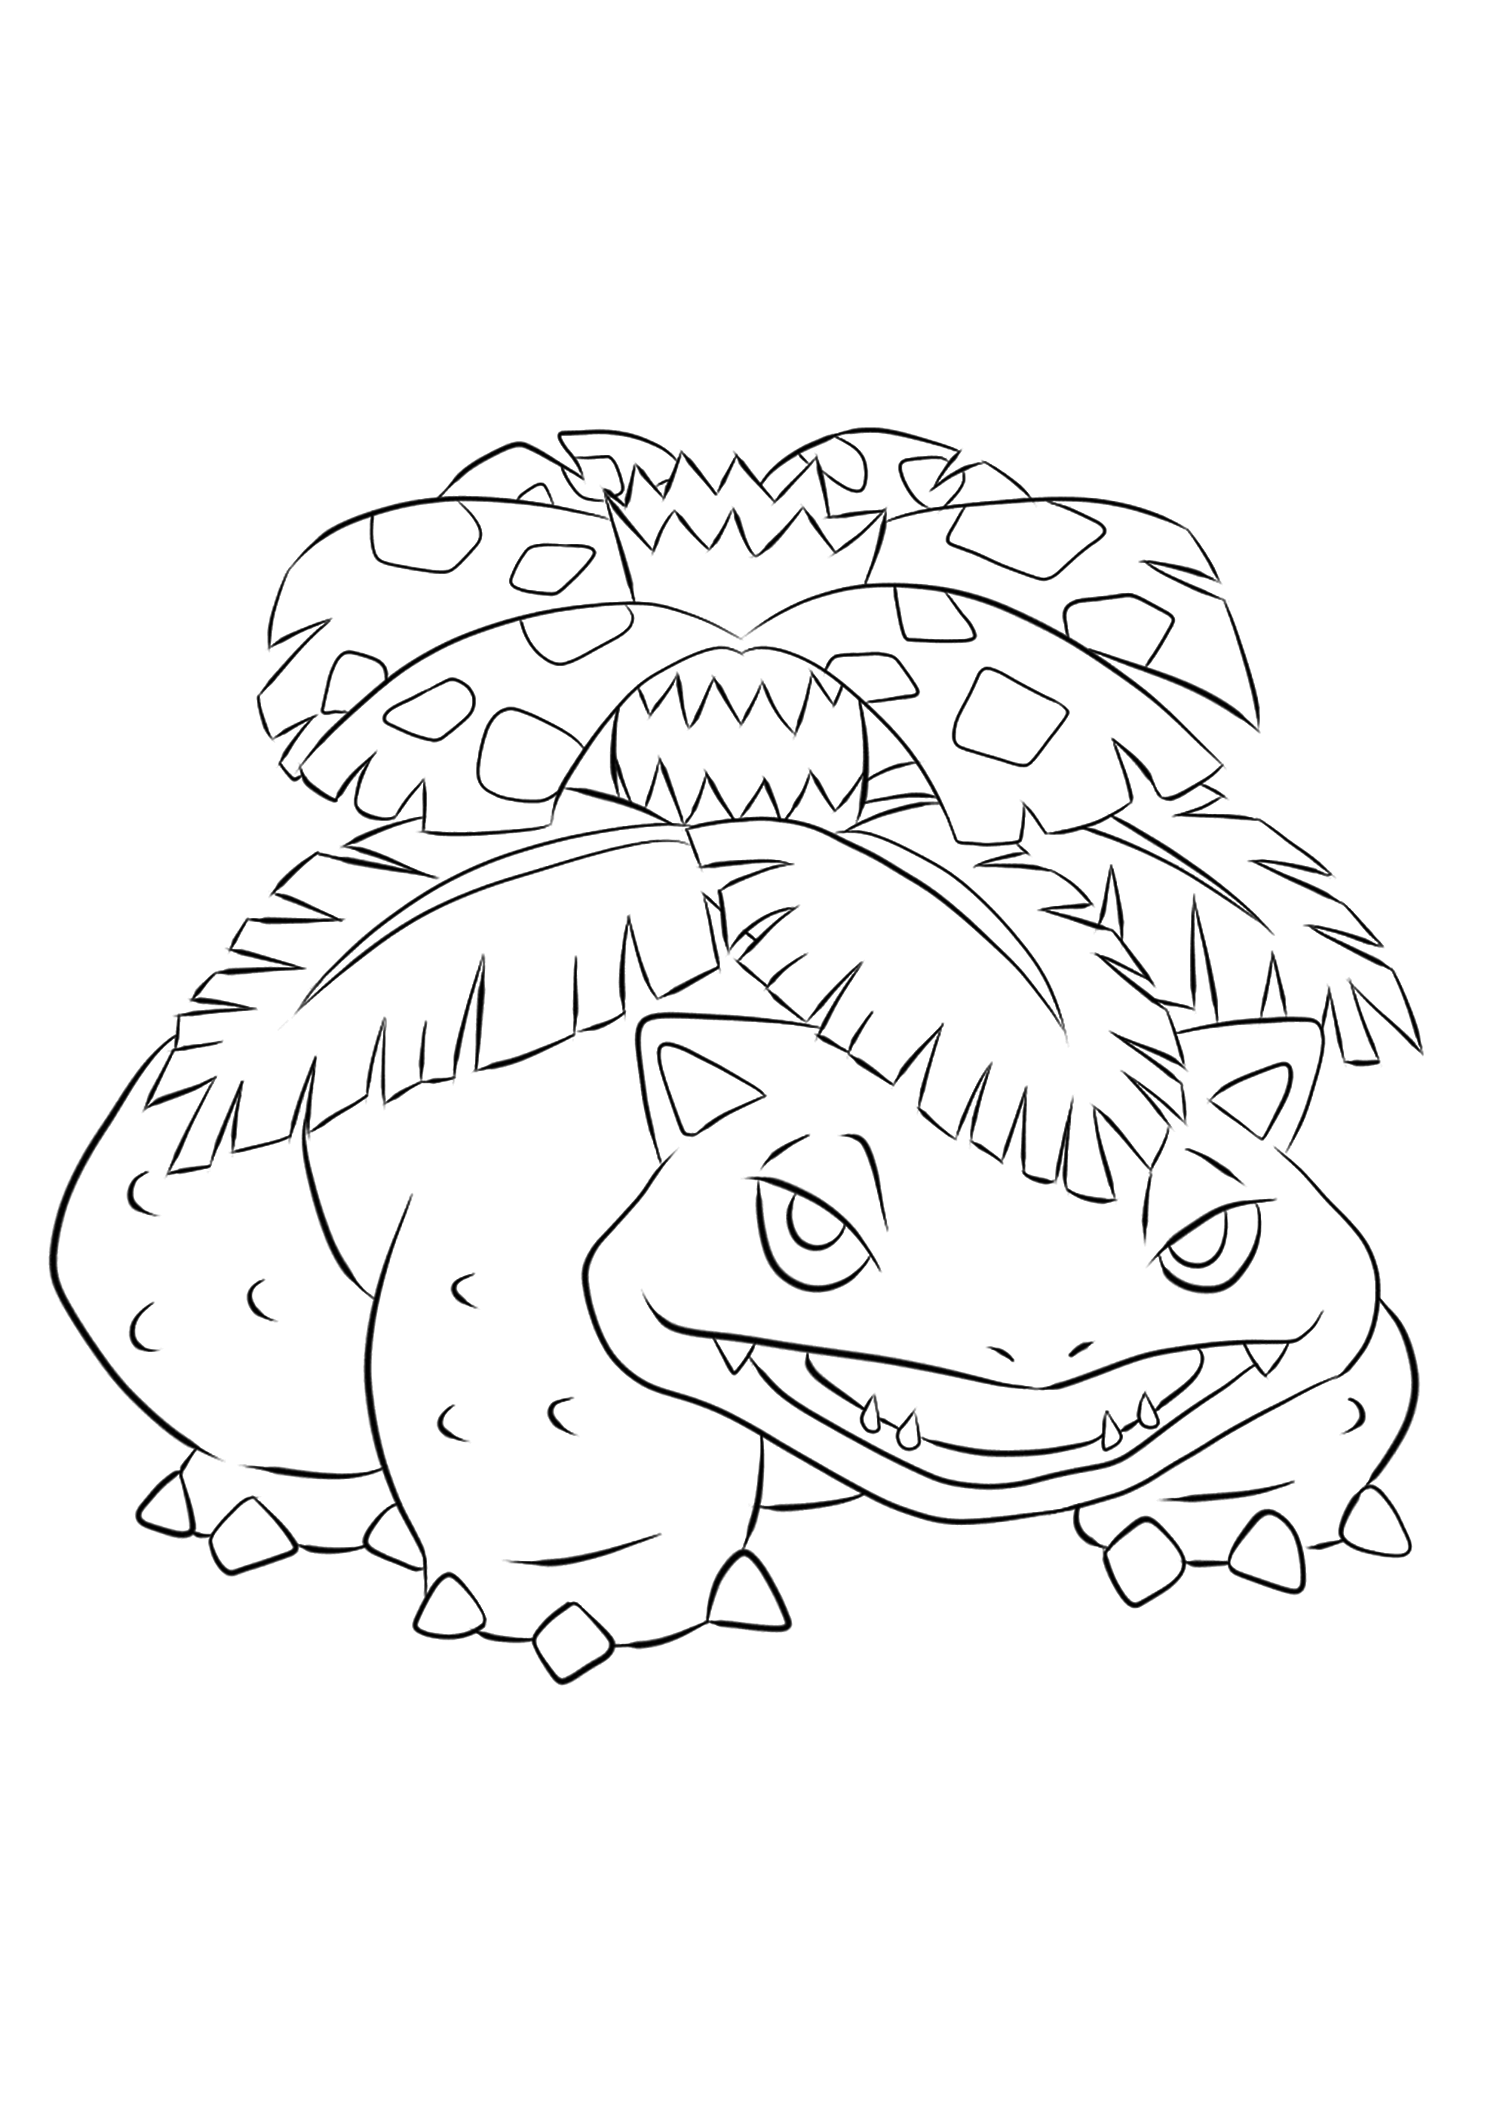 <b>Venusaur</b> (No.03) : Pokemon (Generation I)